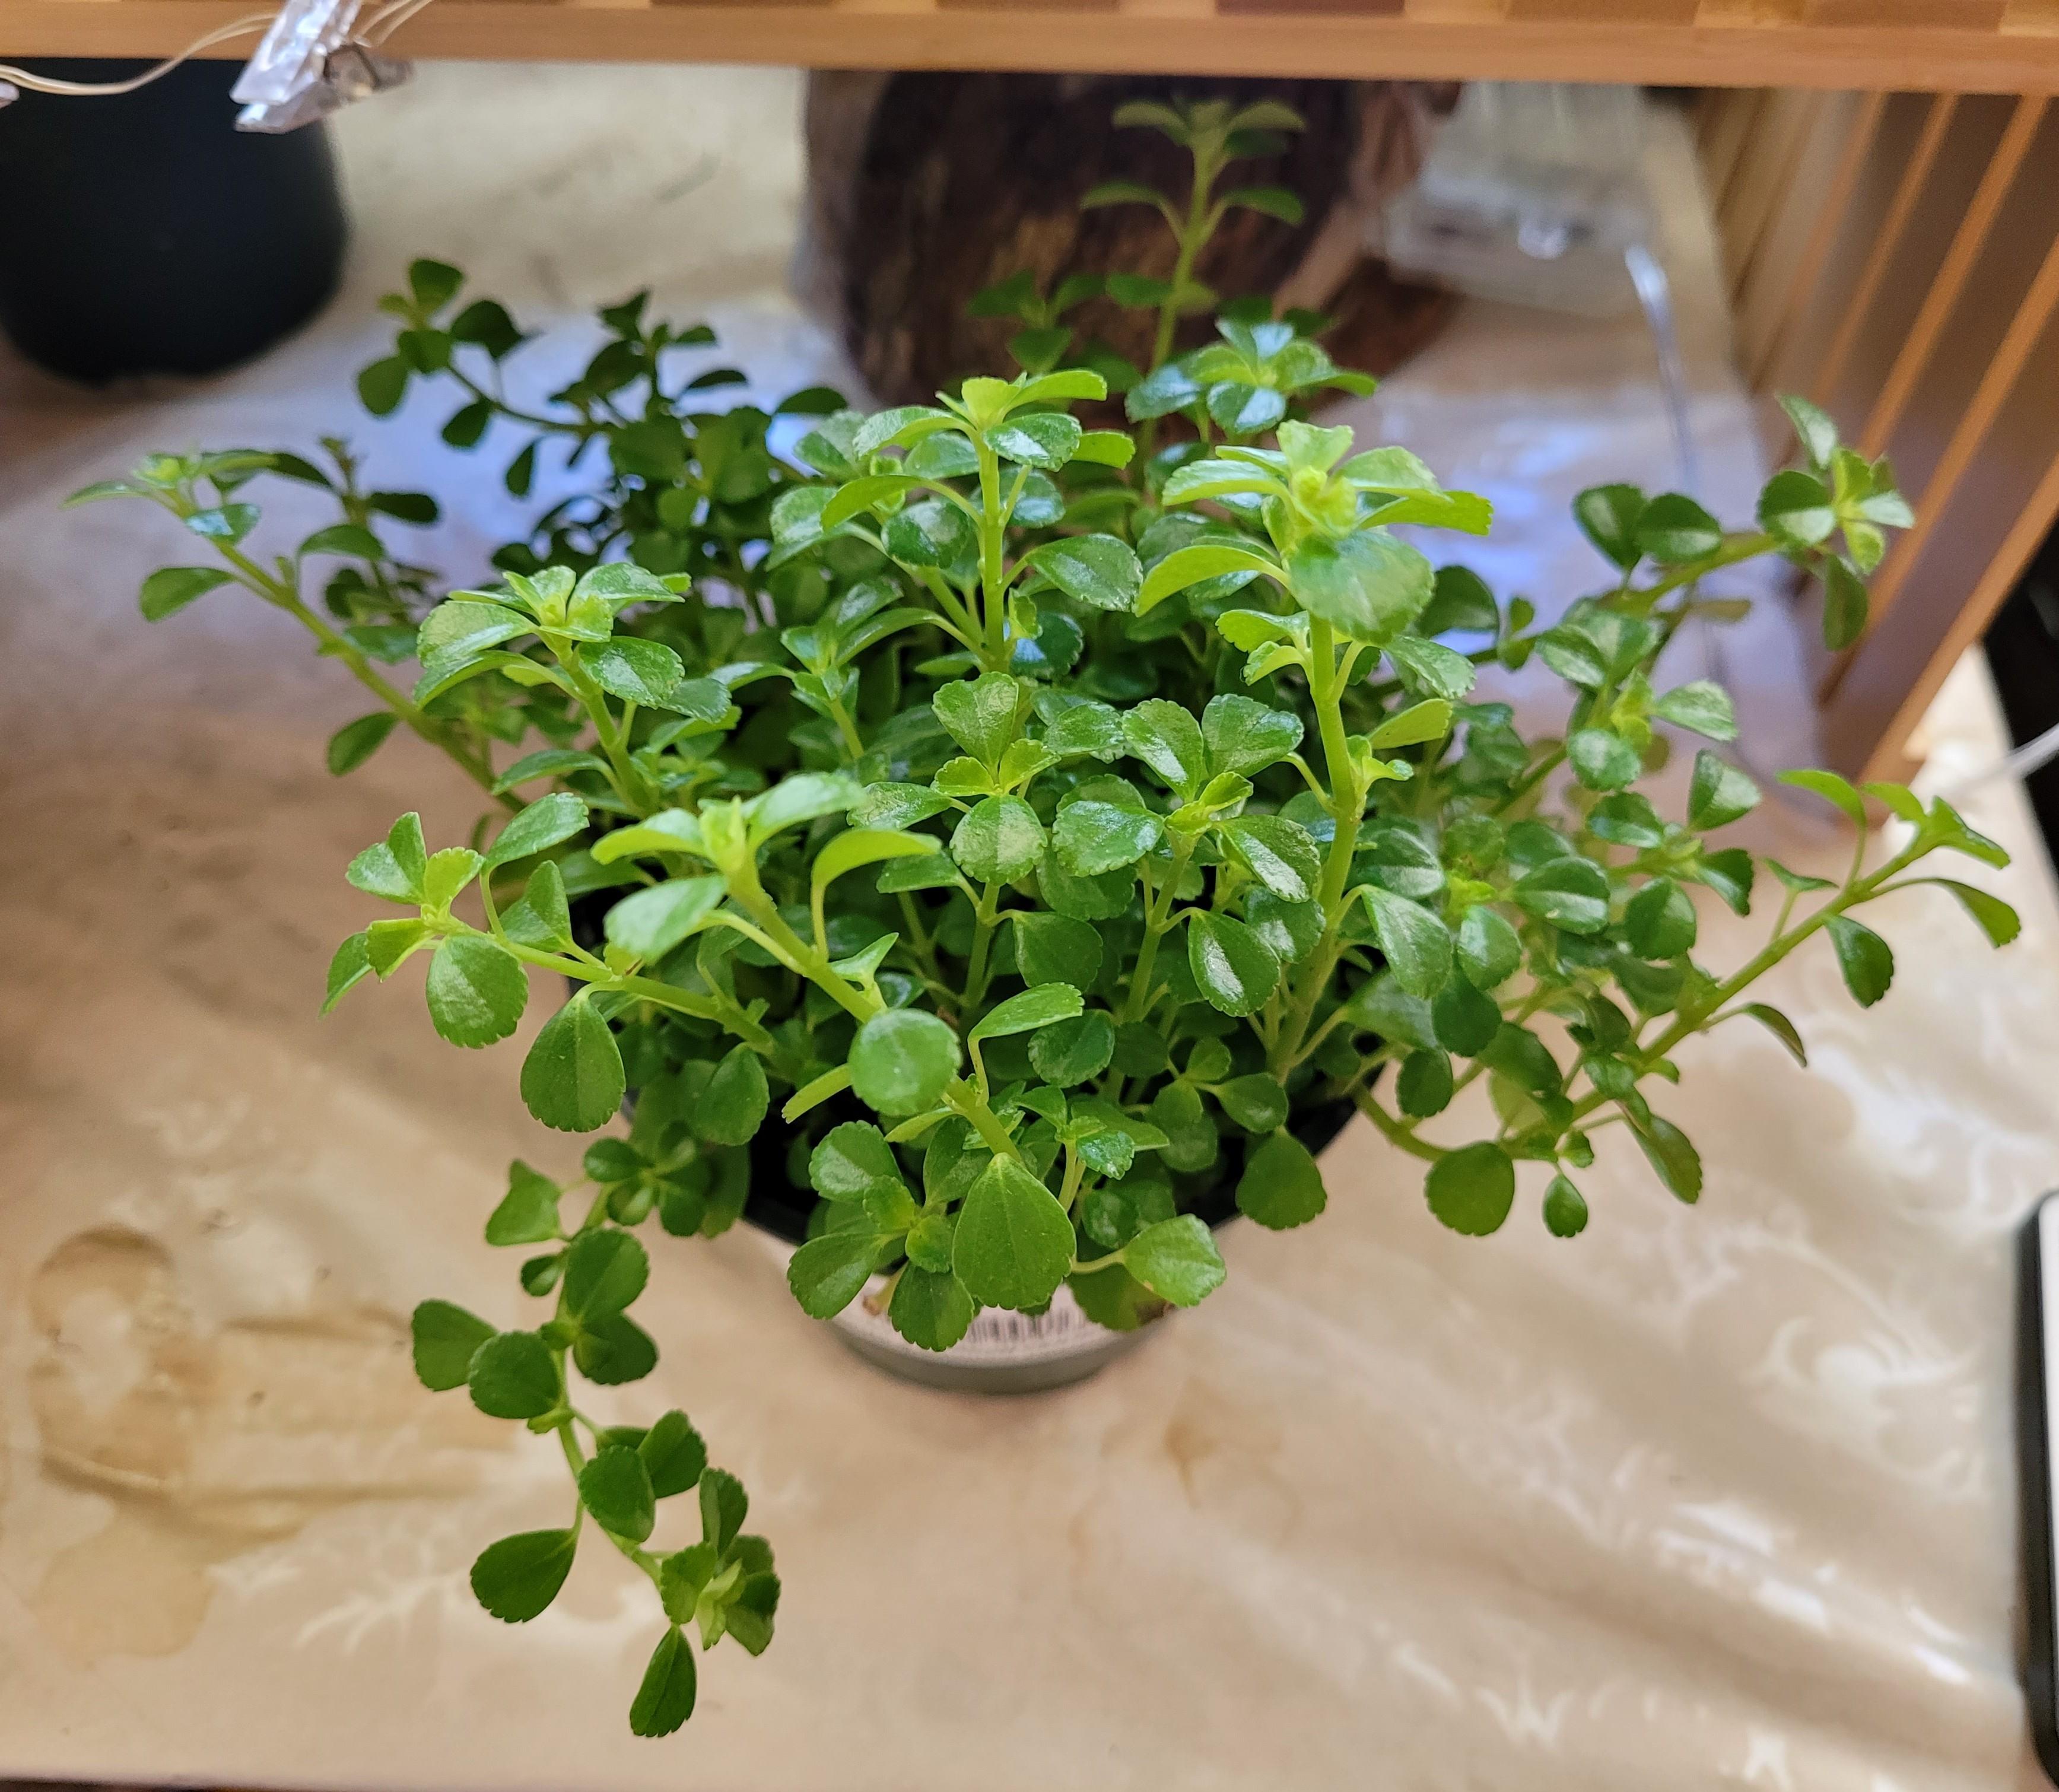 Creeping peperomia plant